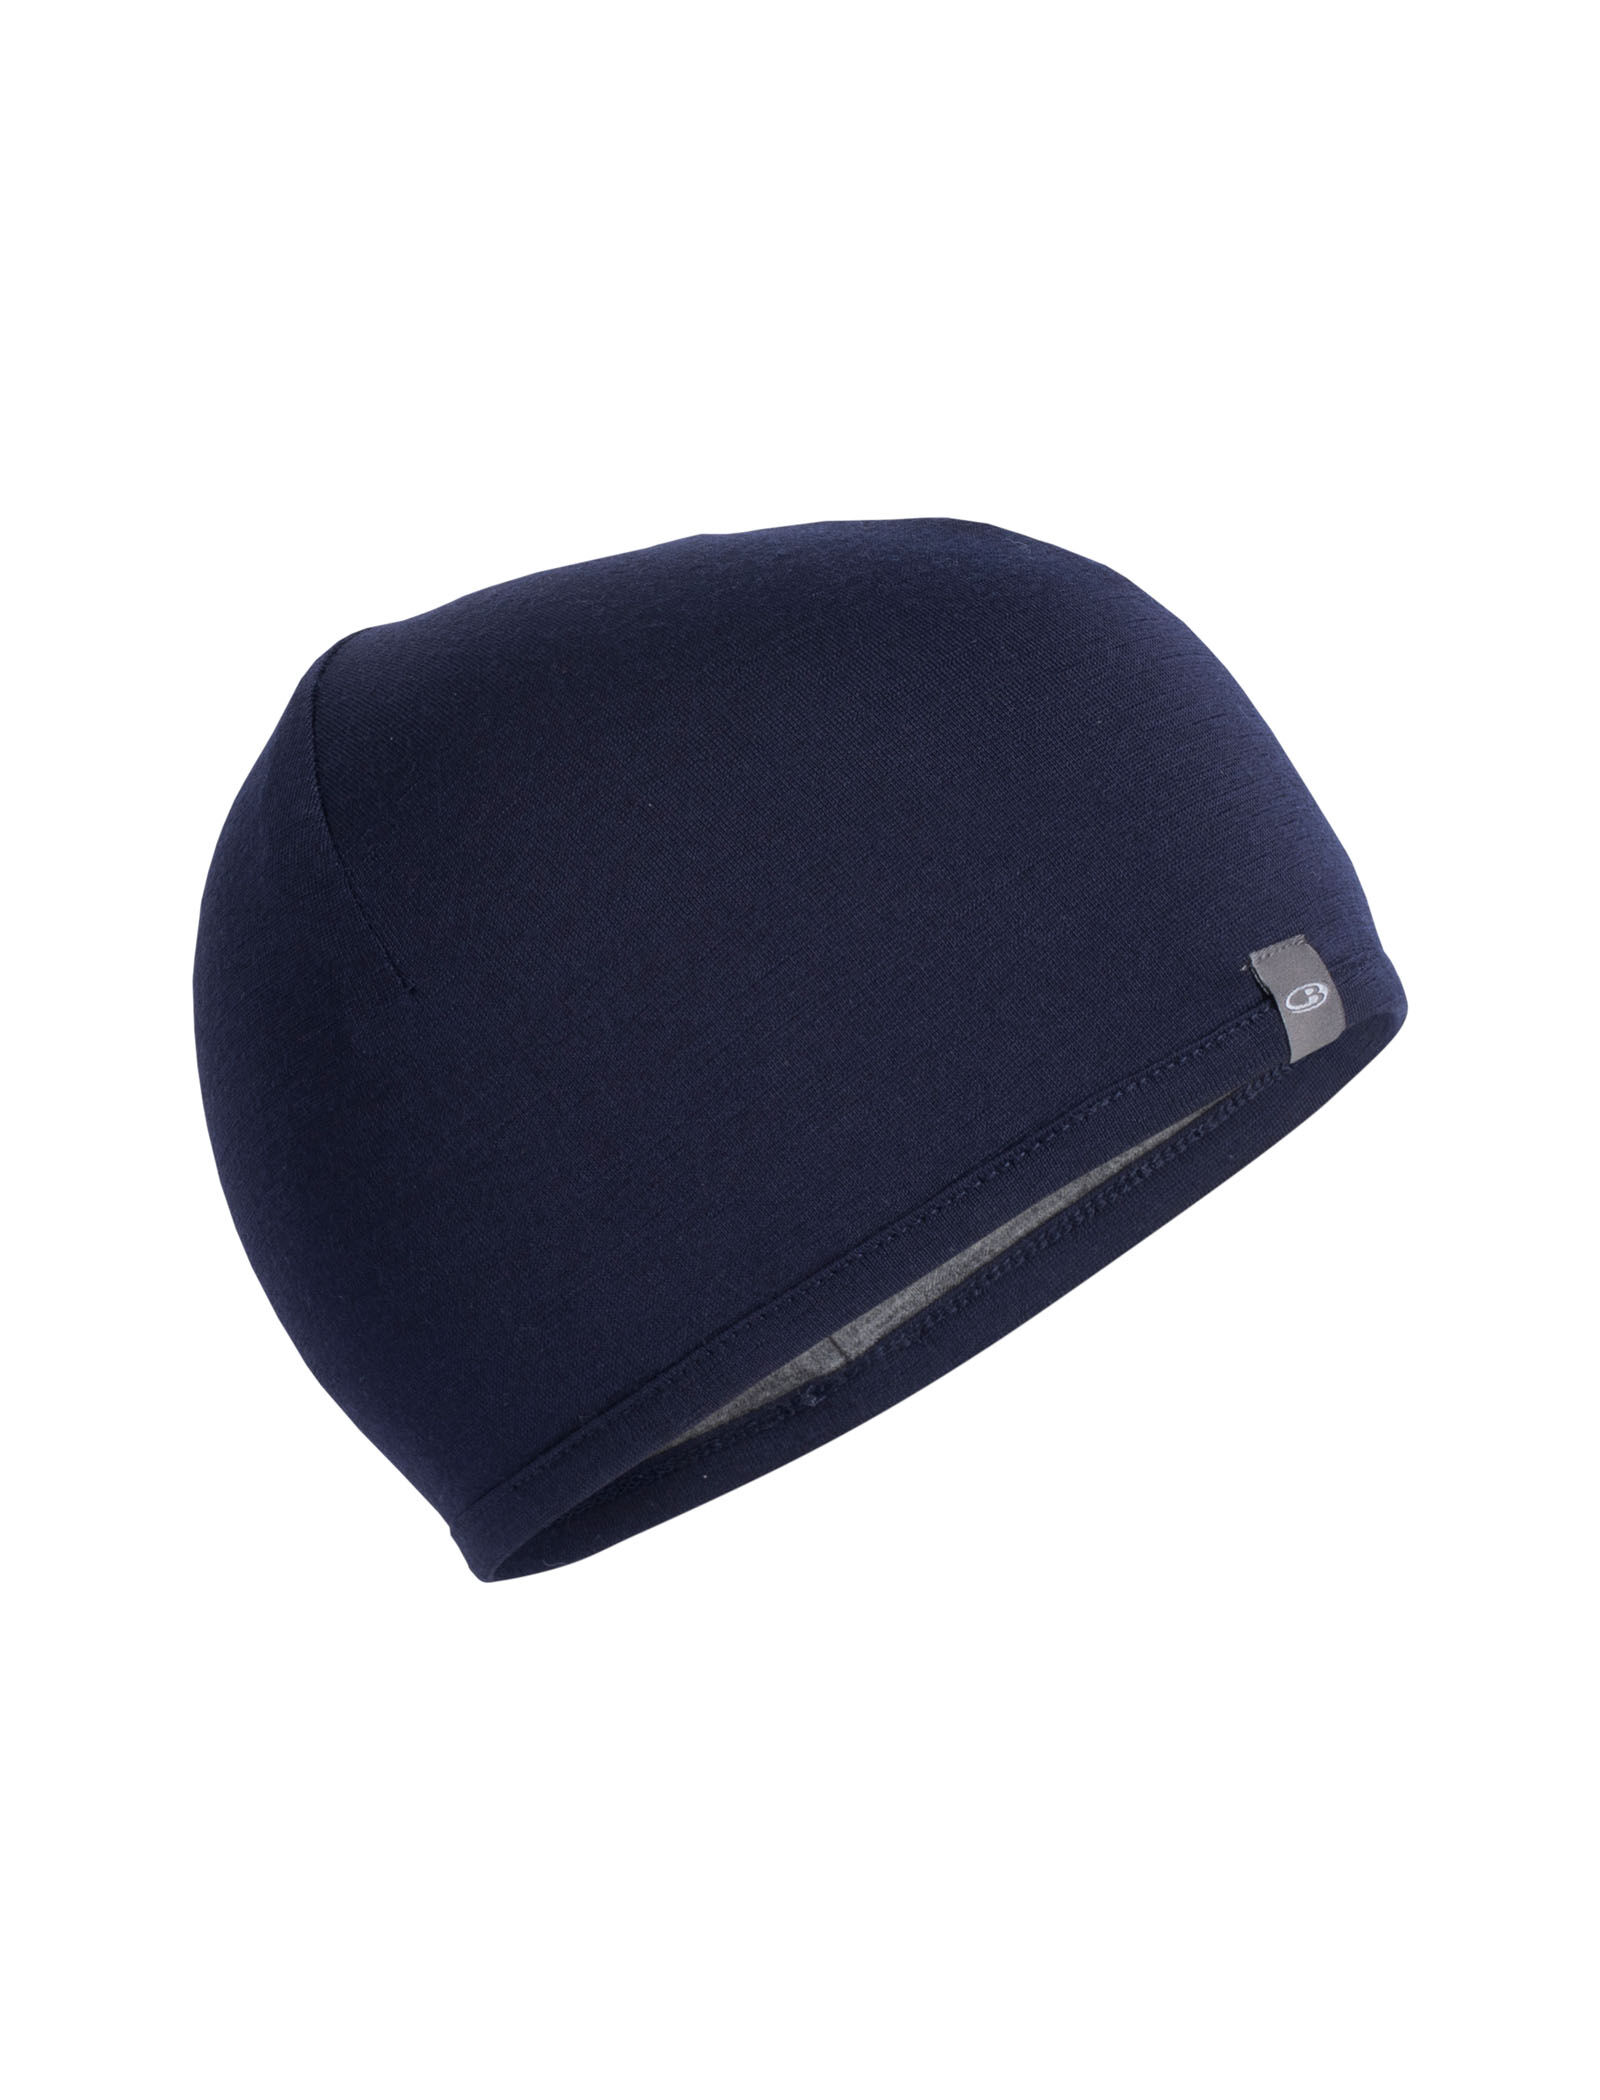 Black Icebreaker Merino Zone Beanie Cold Weather Hats One Size